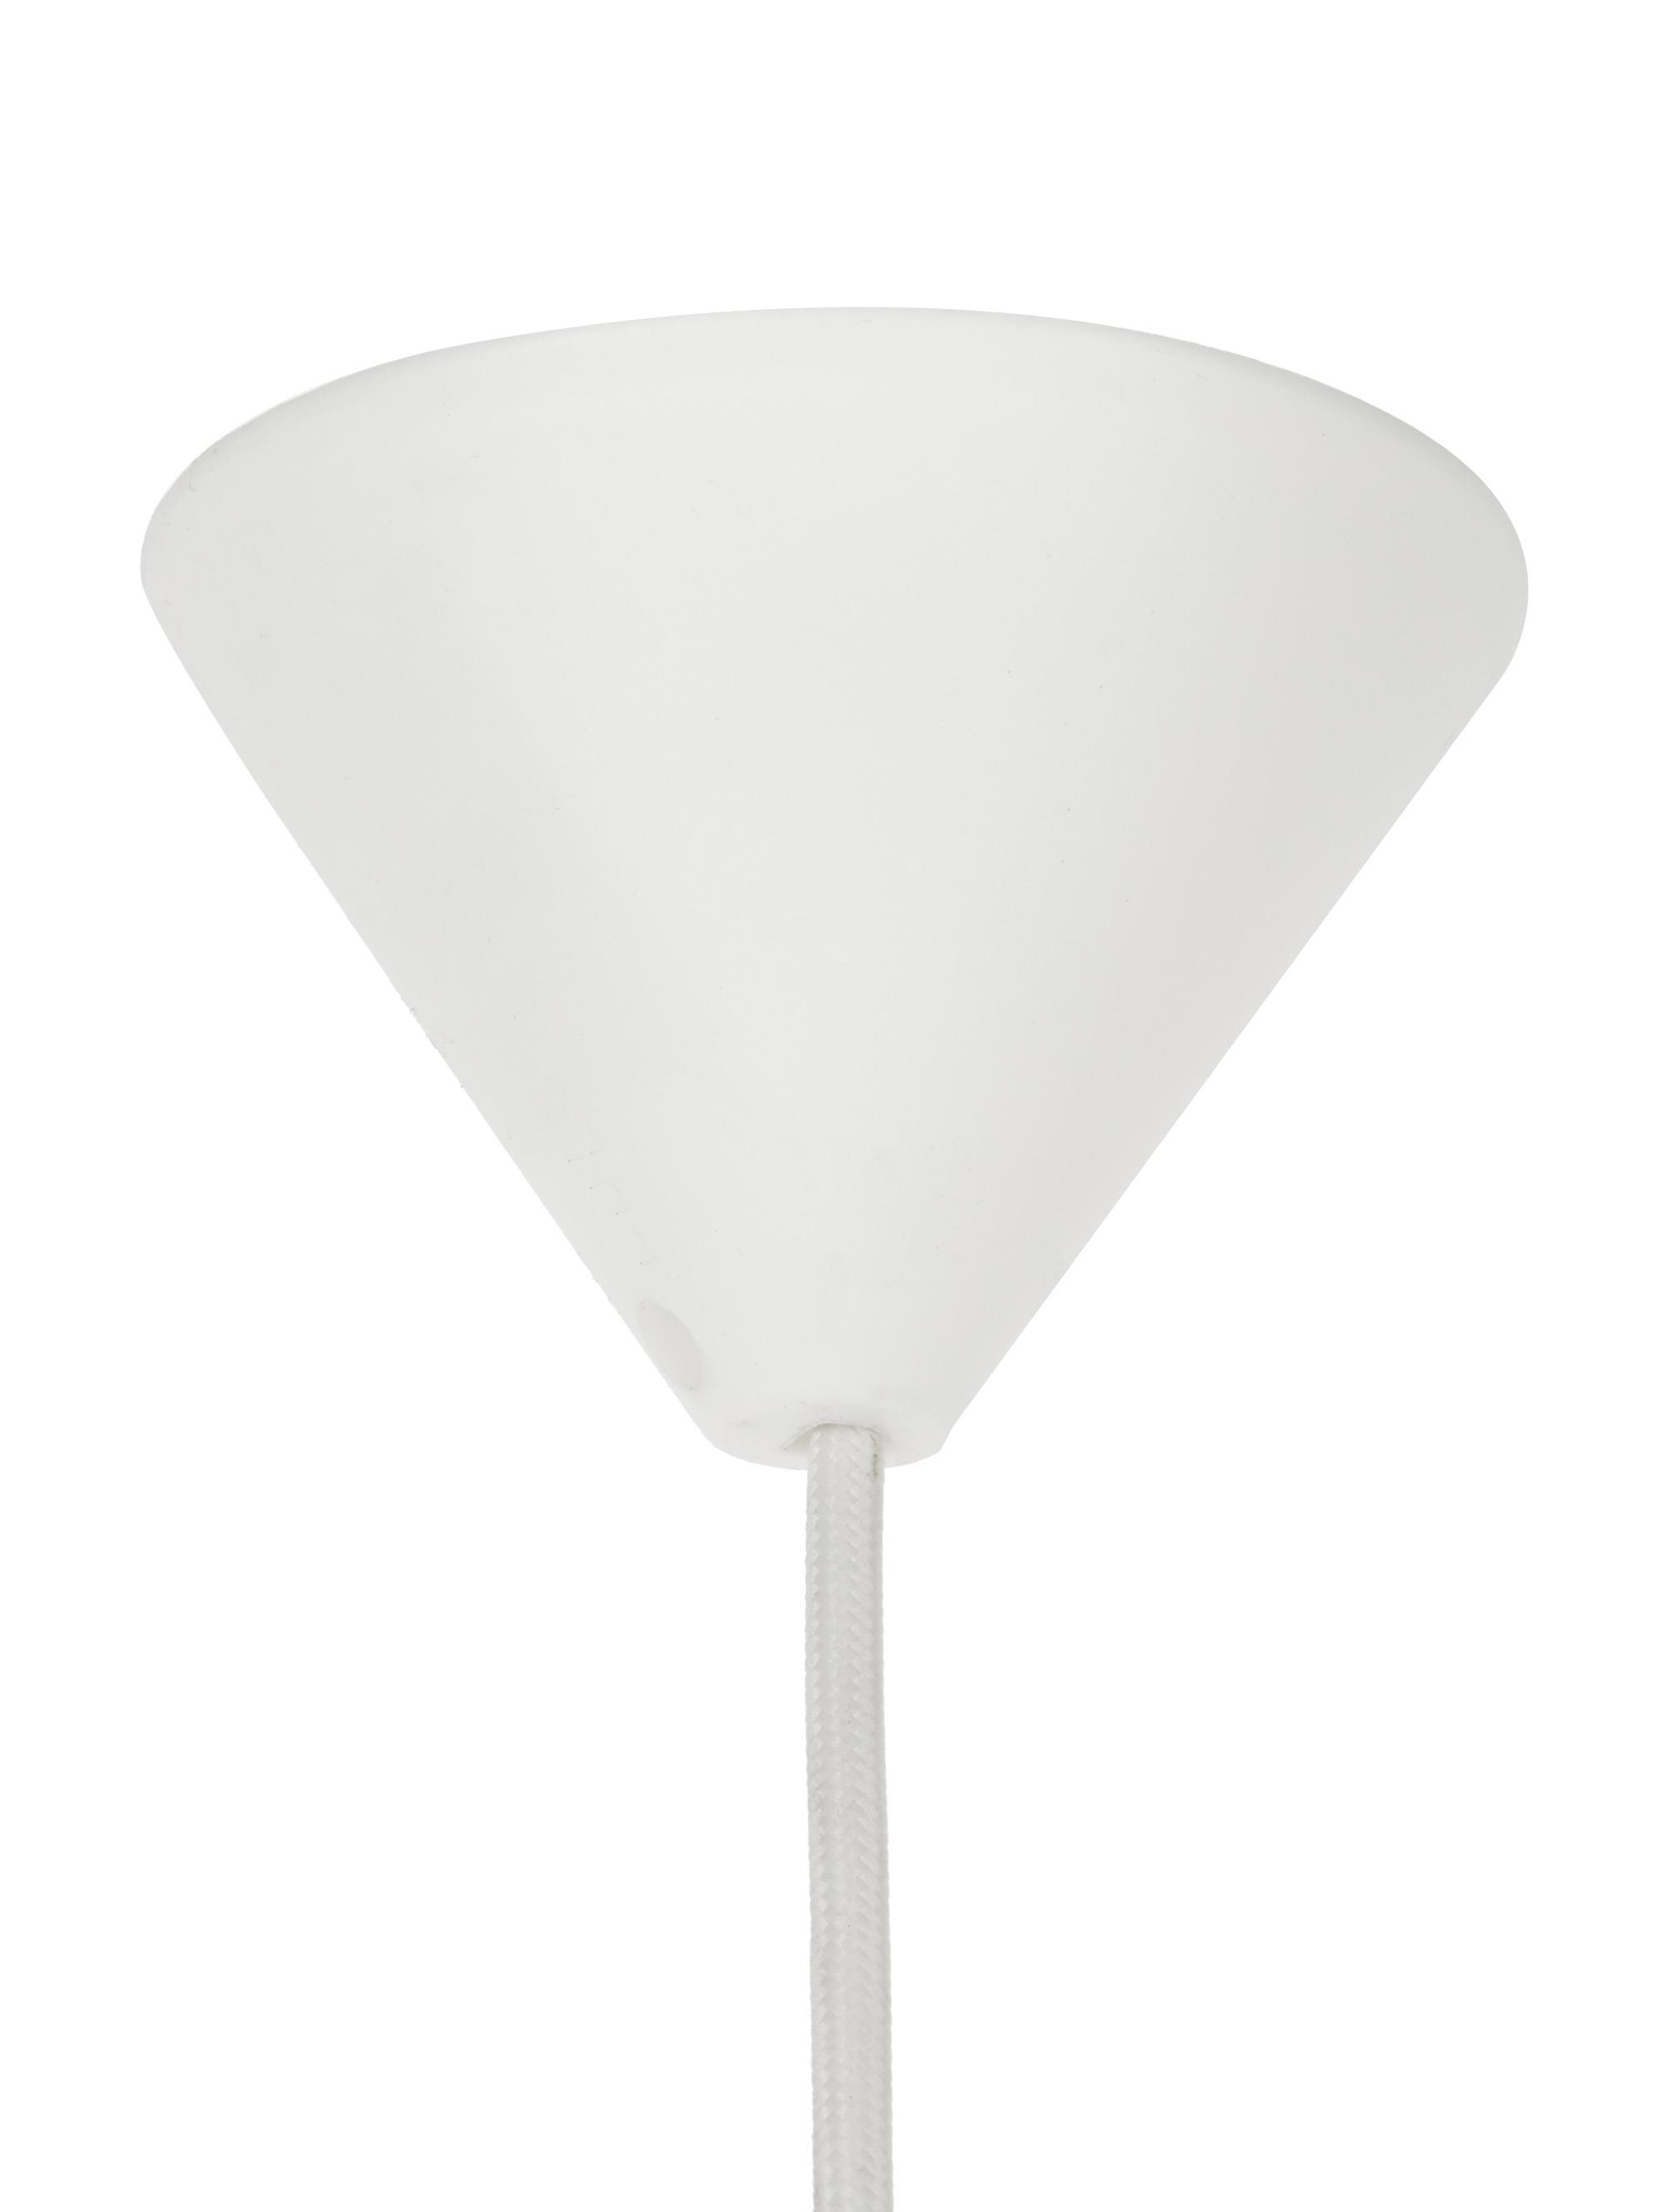 Lampada a sospensione Carmina, Paralume: polipropilene, Bianco, Ø 48 cm x Alt. 36 cm